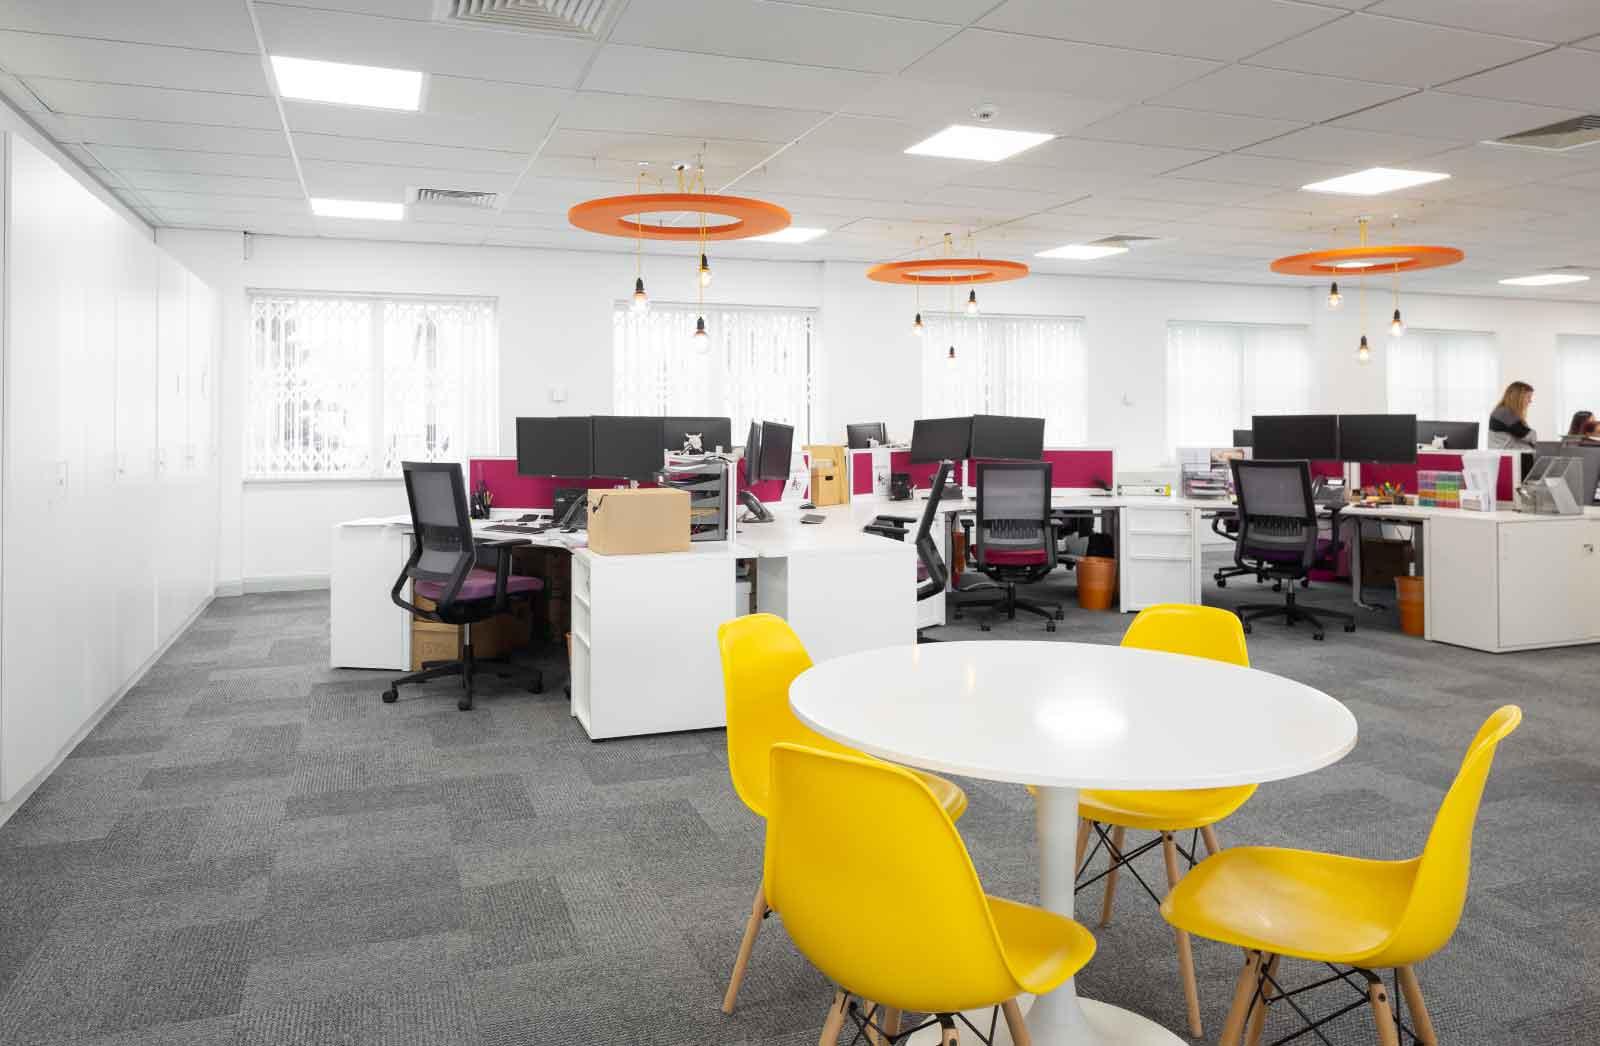 Gordons-Office-Fit-Out-Bradford-Open-Plan-Office